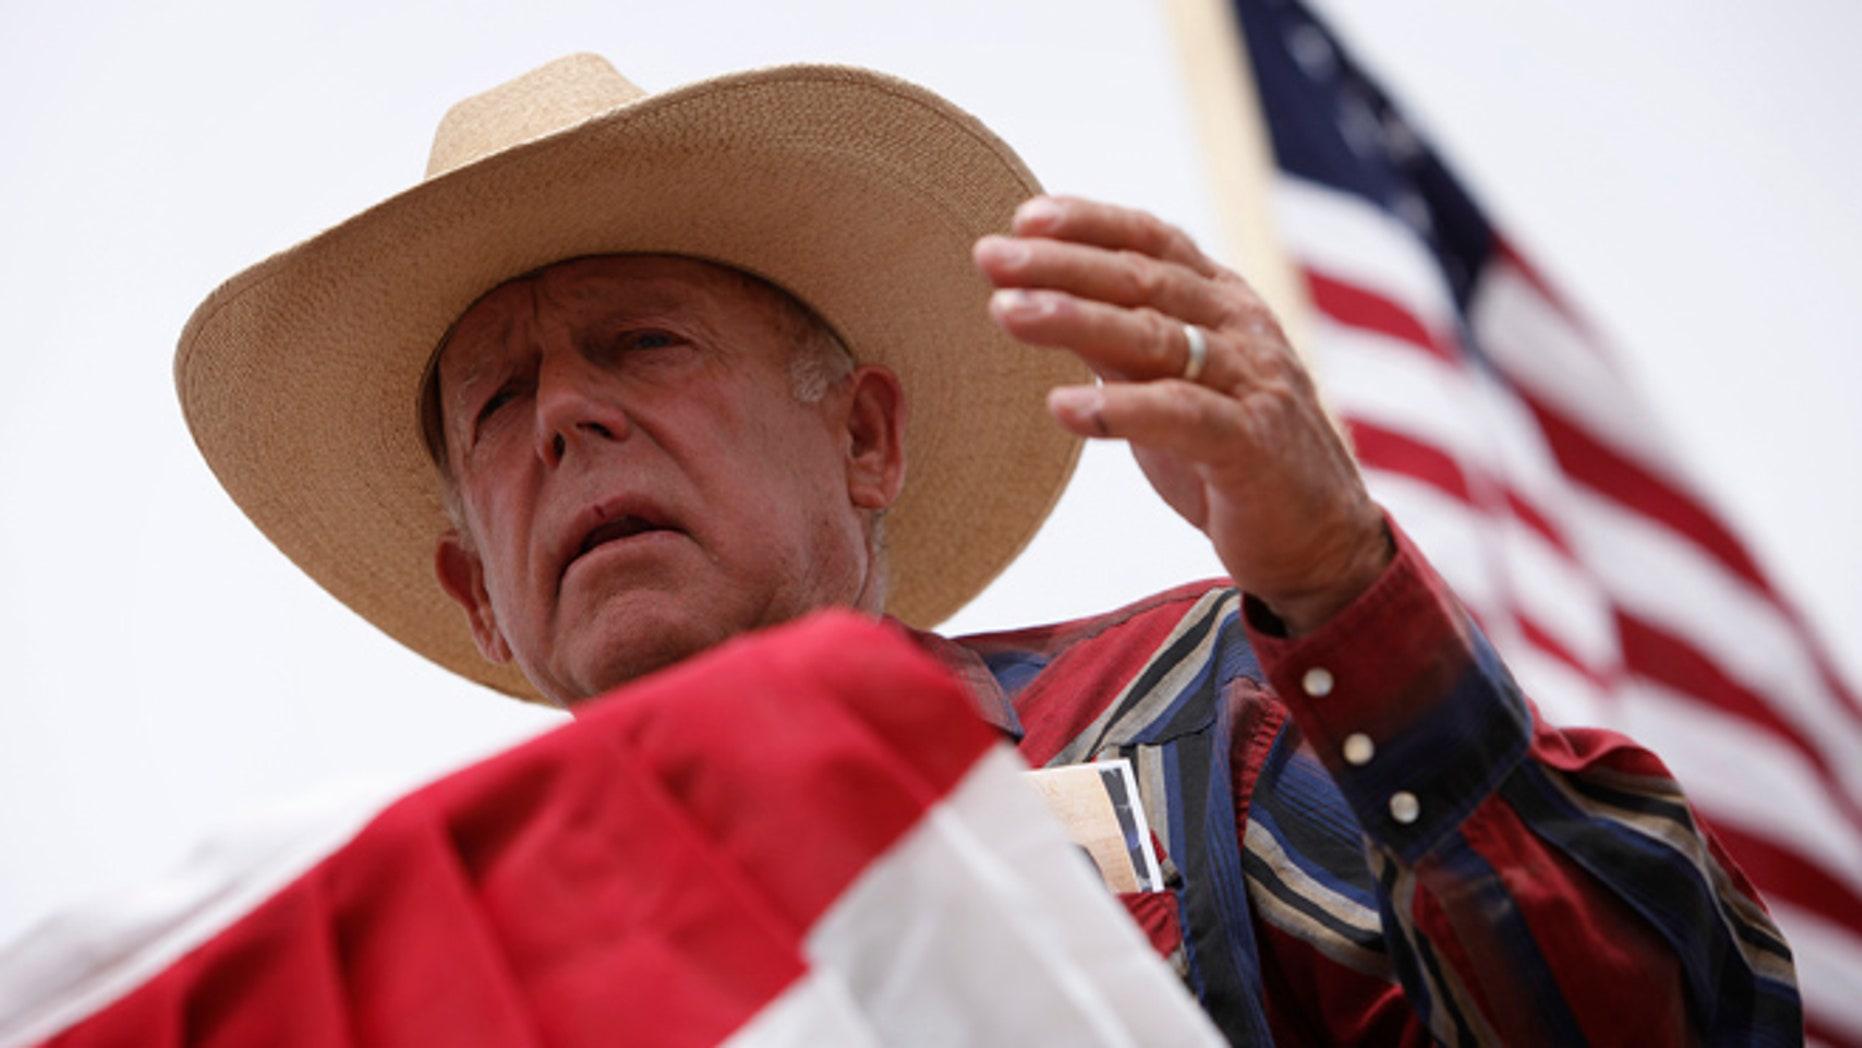 April 18, 2014: Rancher Cliven Bundy speaks at a protest camp near Bunkerville, Nev.